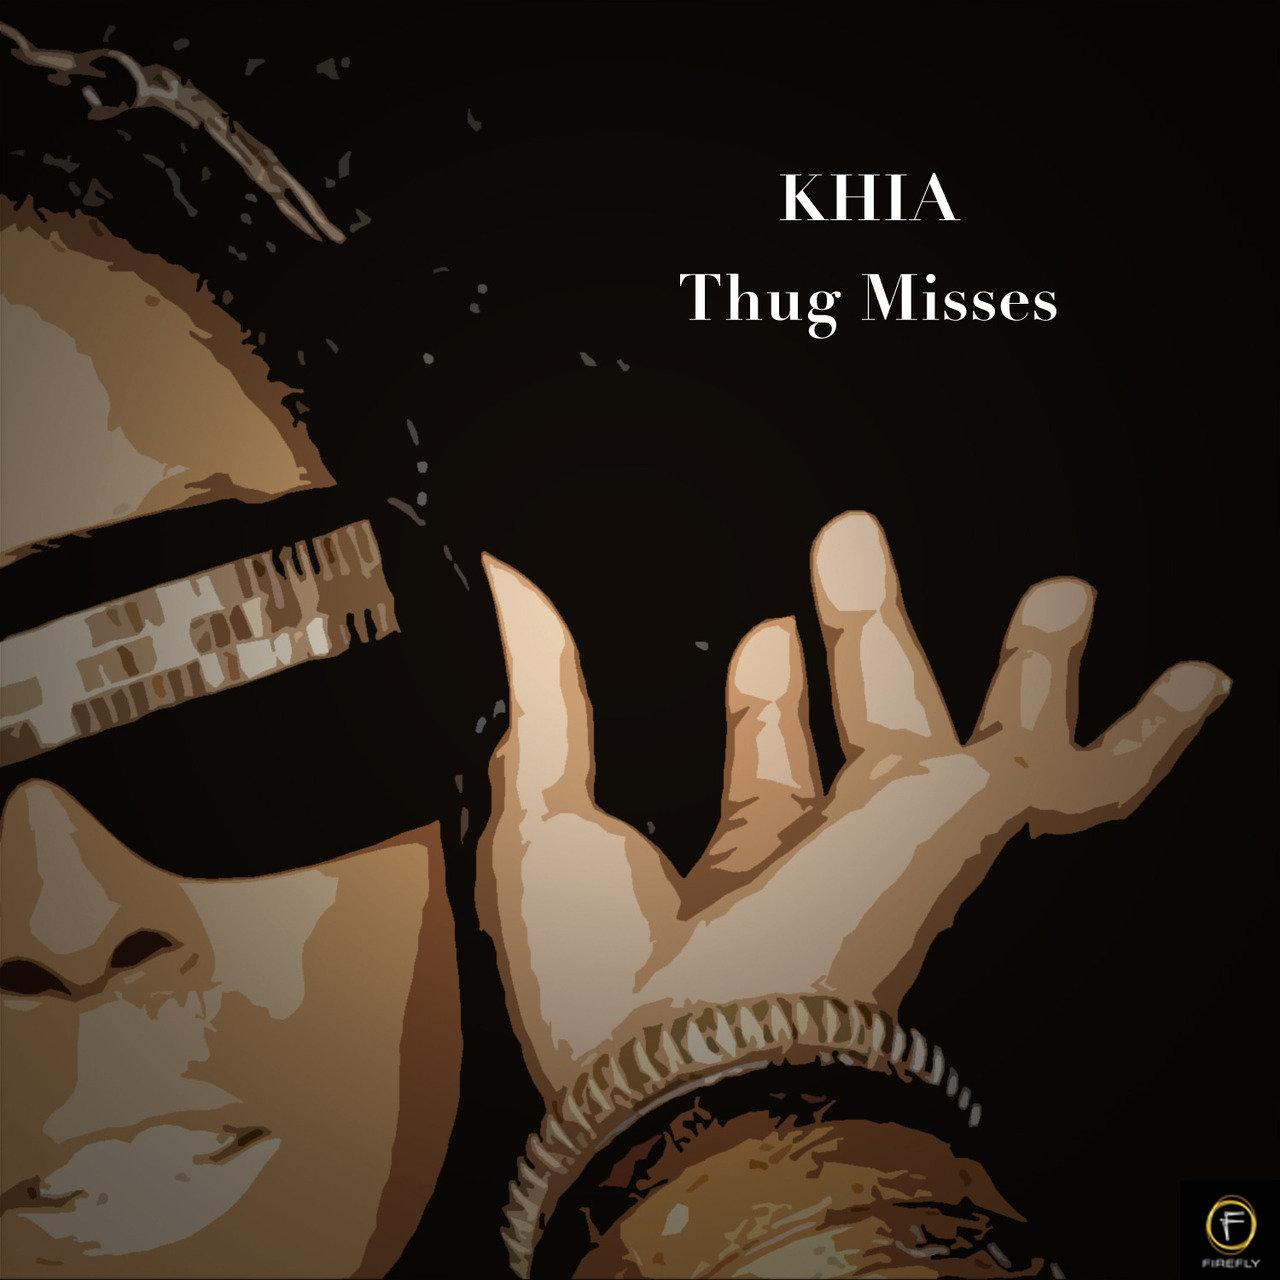 Theme interesting, Khia lick it good theme.... something